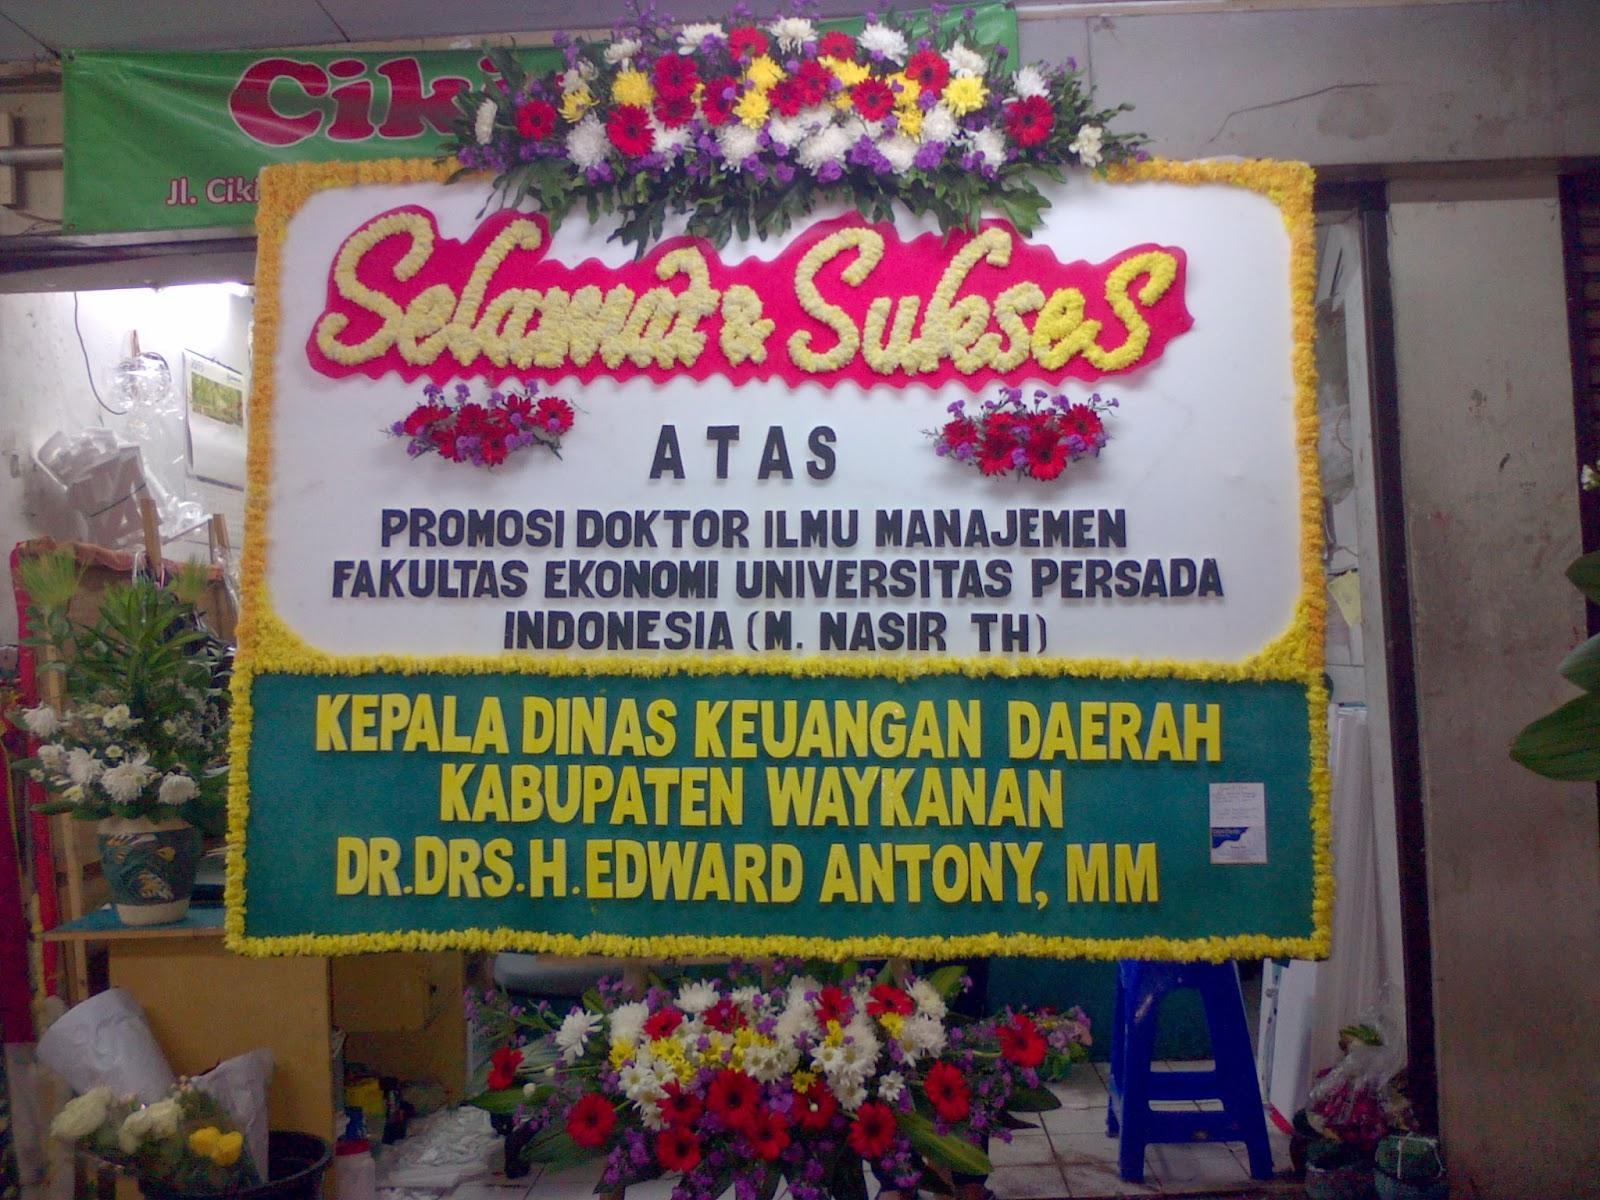 Toko Bunga Cikiniflorist Jakarta Contoh Produksi Bunga Papan Selamat Sukses Jakarta